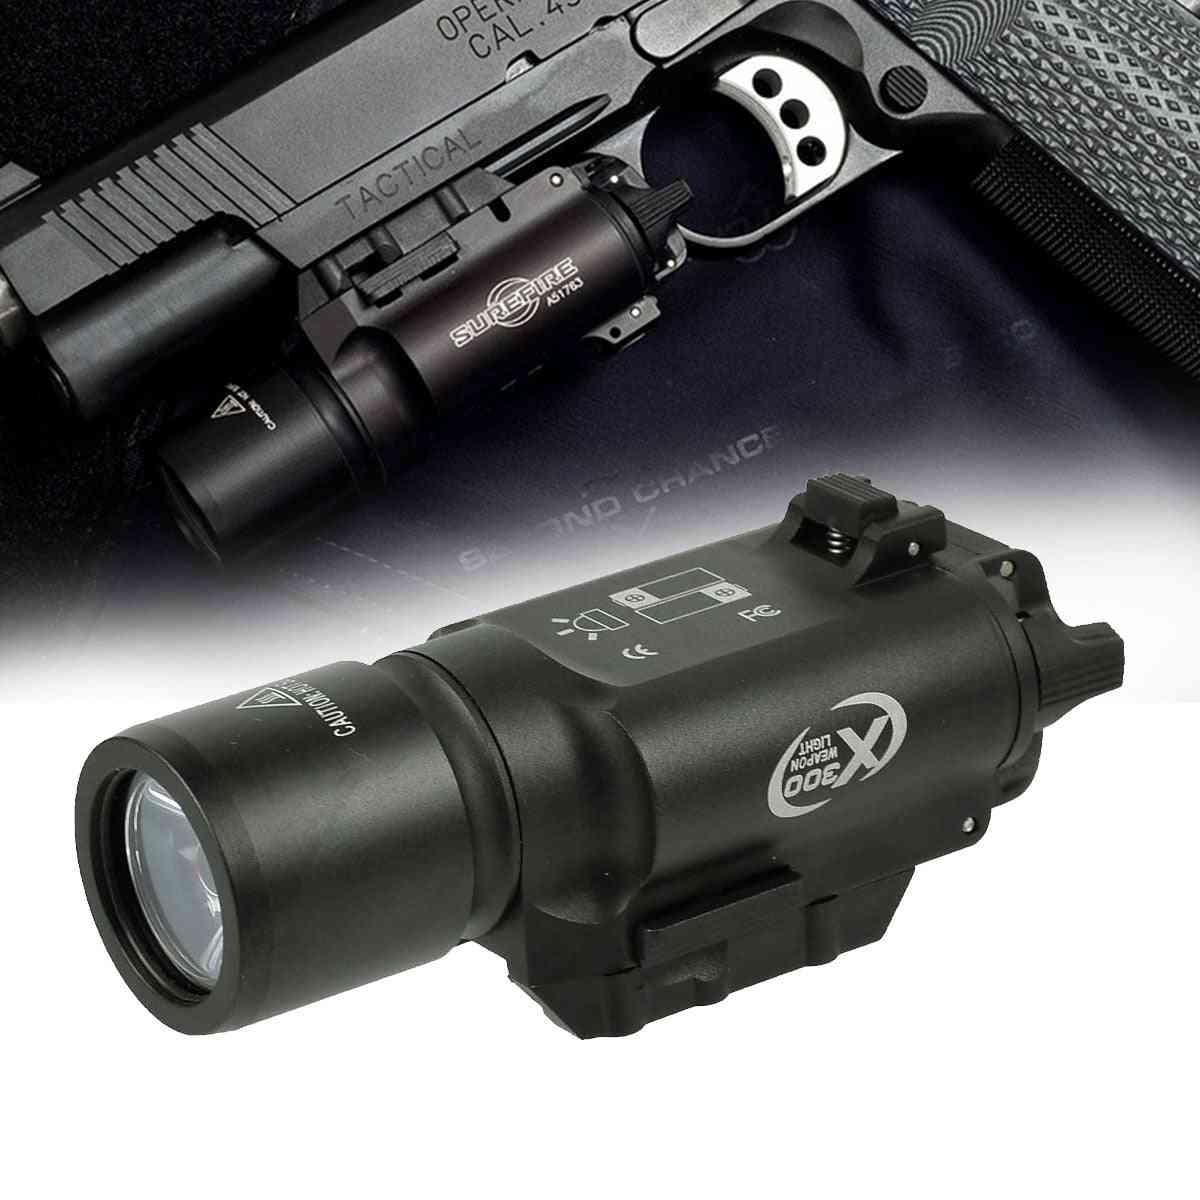 Lumens Tactical Ultra Pistol Gun Weapon Light, Lanterna Airsoft Flashlight, Picatinny Weaver Rail